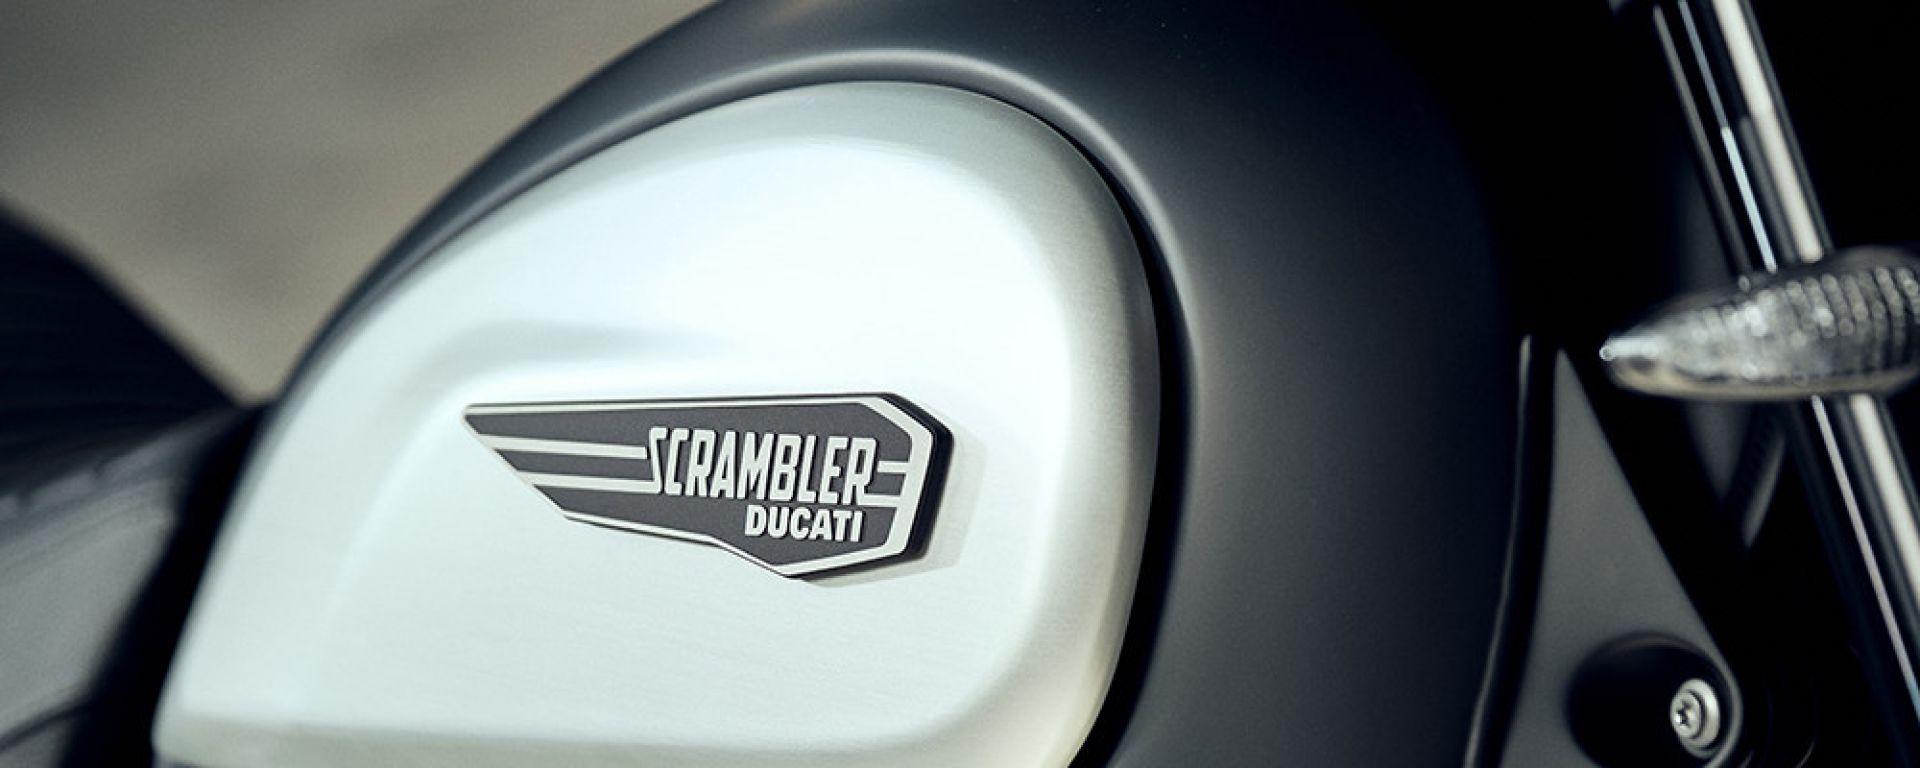 Scrambler1100 Dark PRO: la livrea Dark Stealth